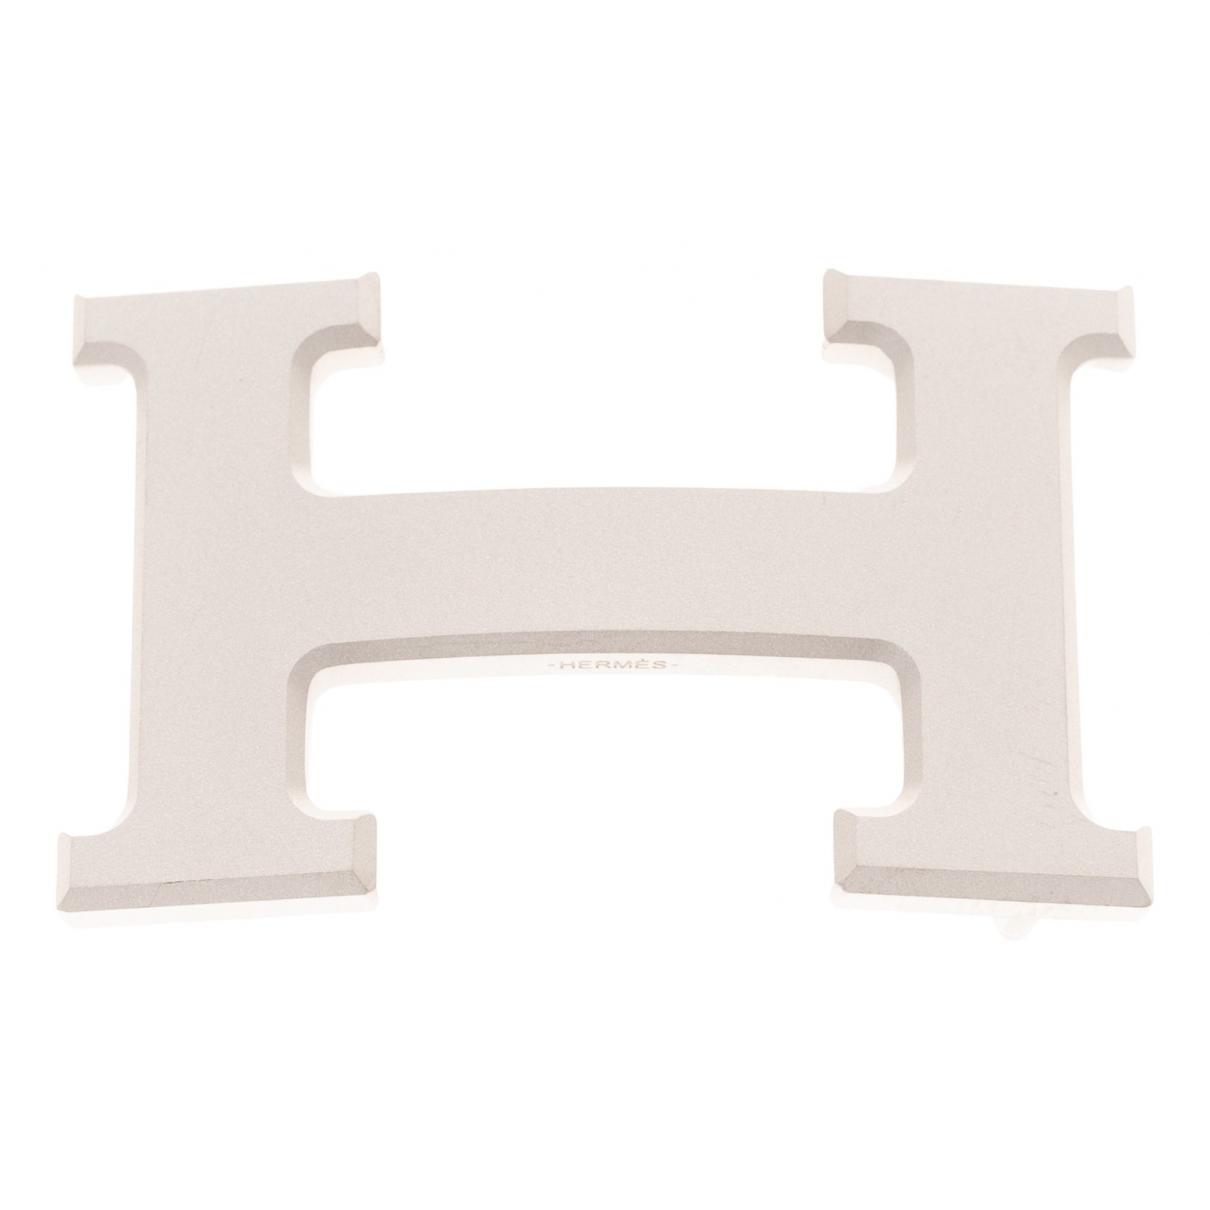 Cinturon Boucle seule / Belt buckle Hermes